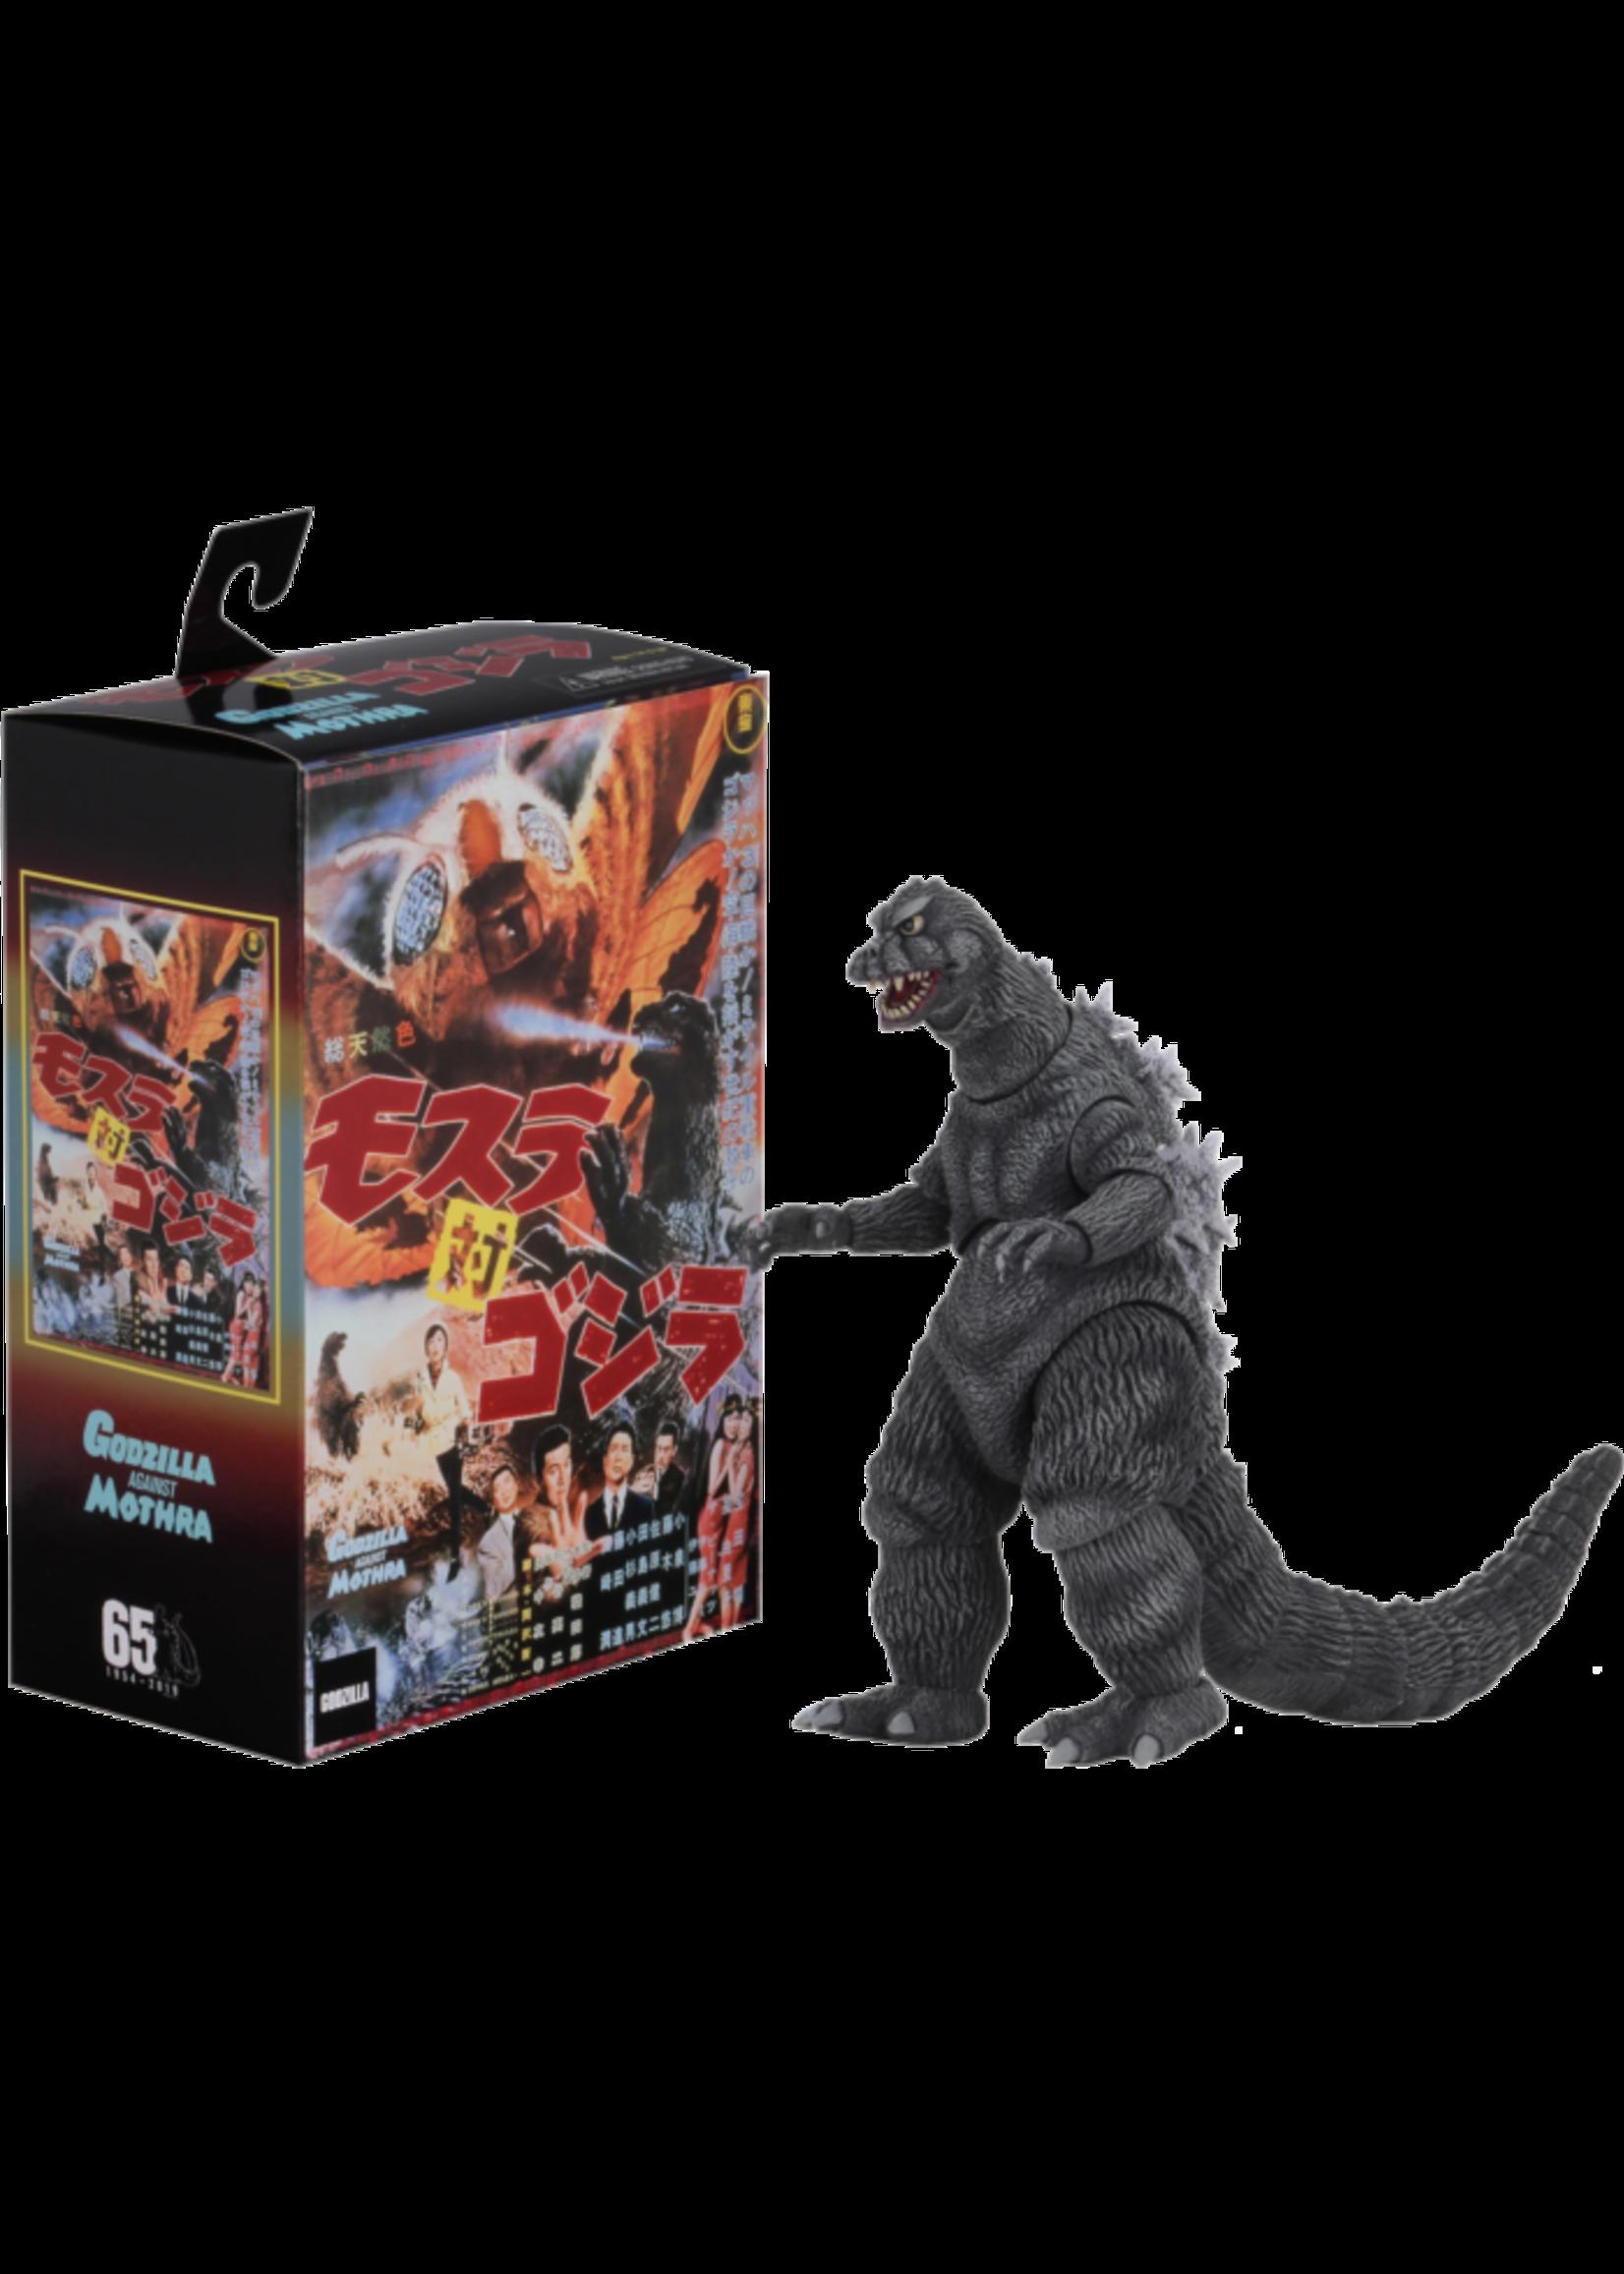 Neca Godzilla: Mothra vs Godzilla 1964 Godzilla Action Figure